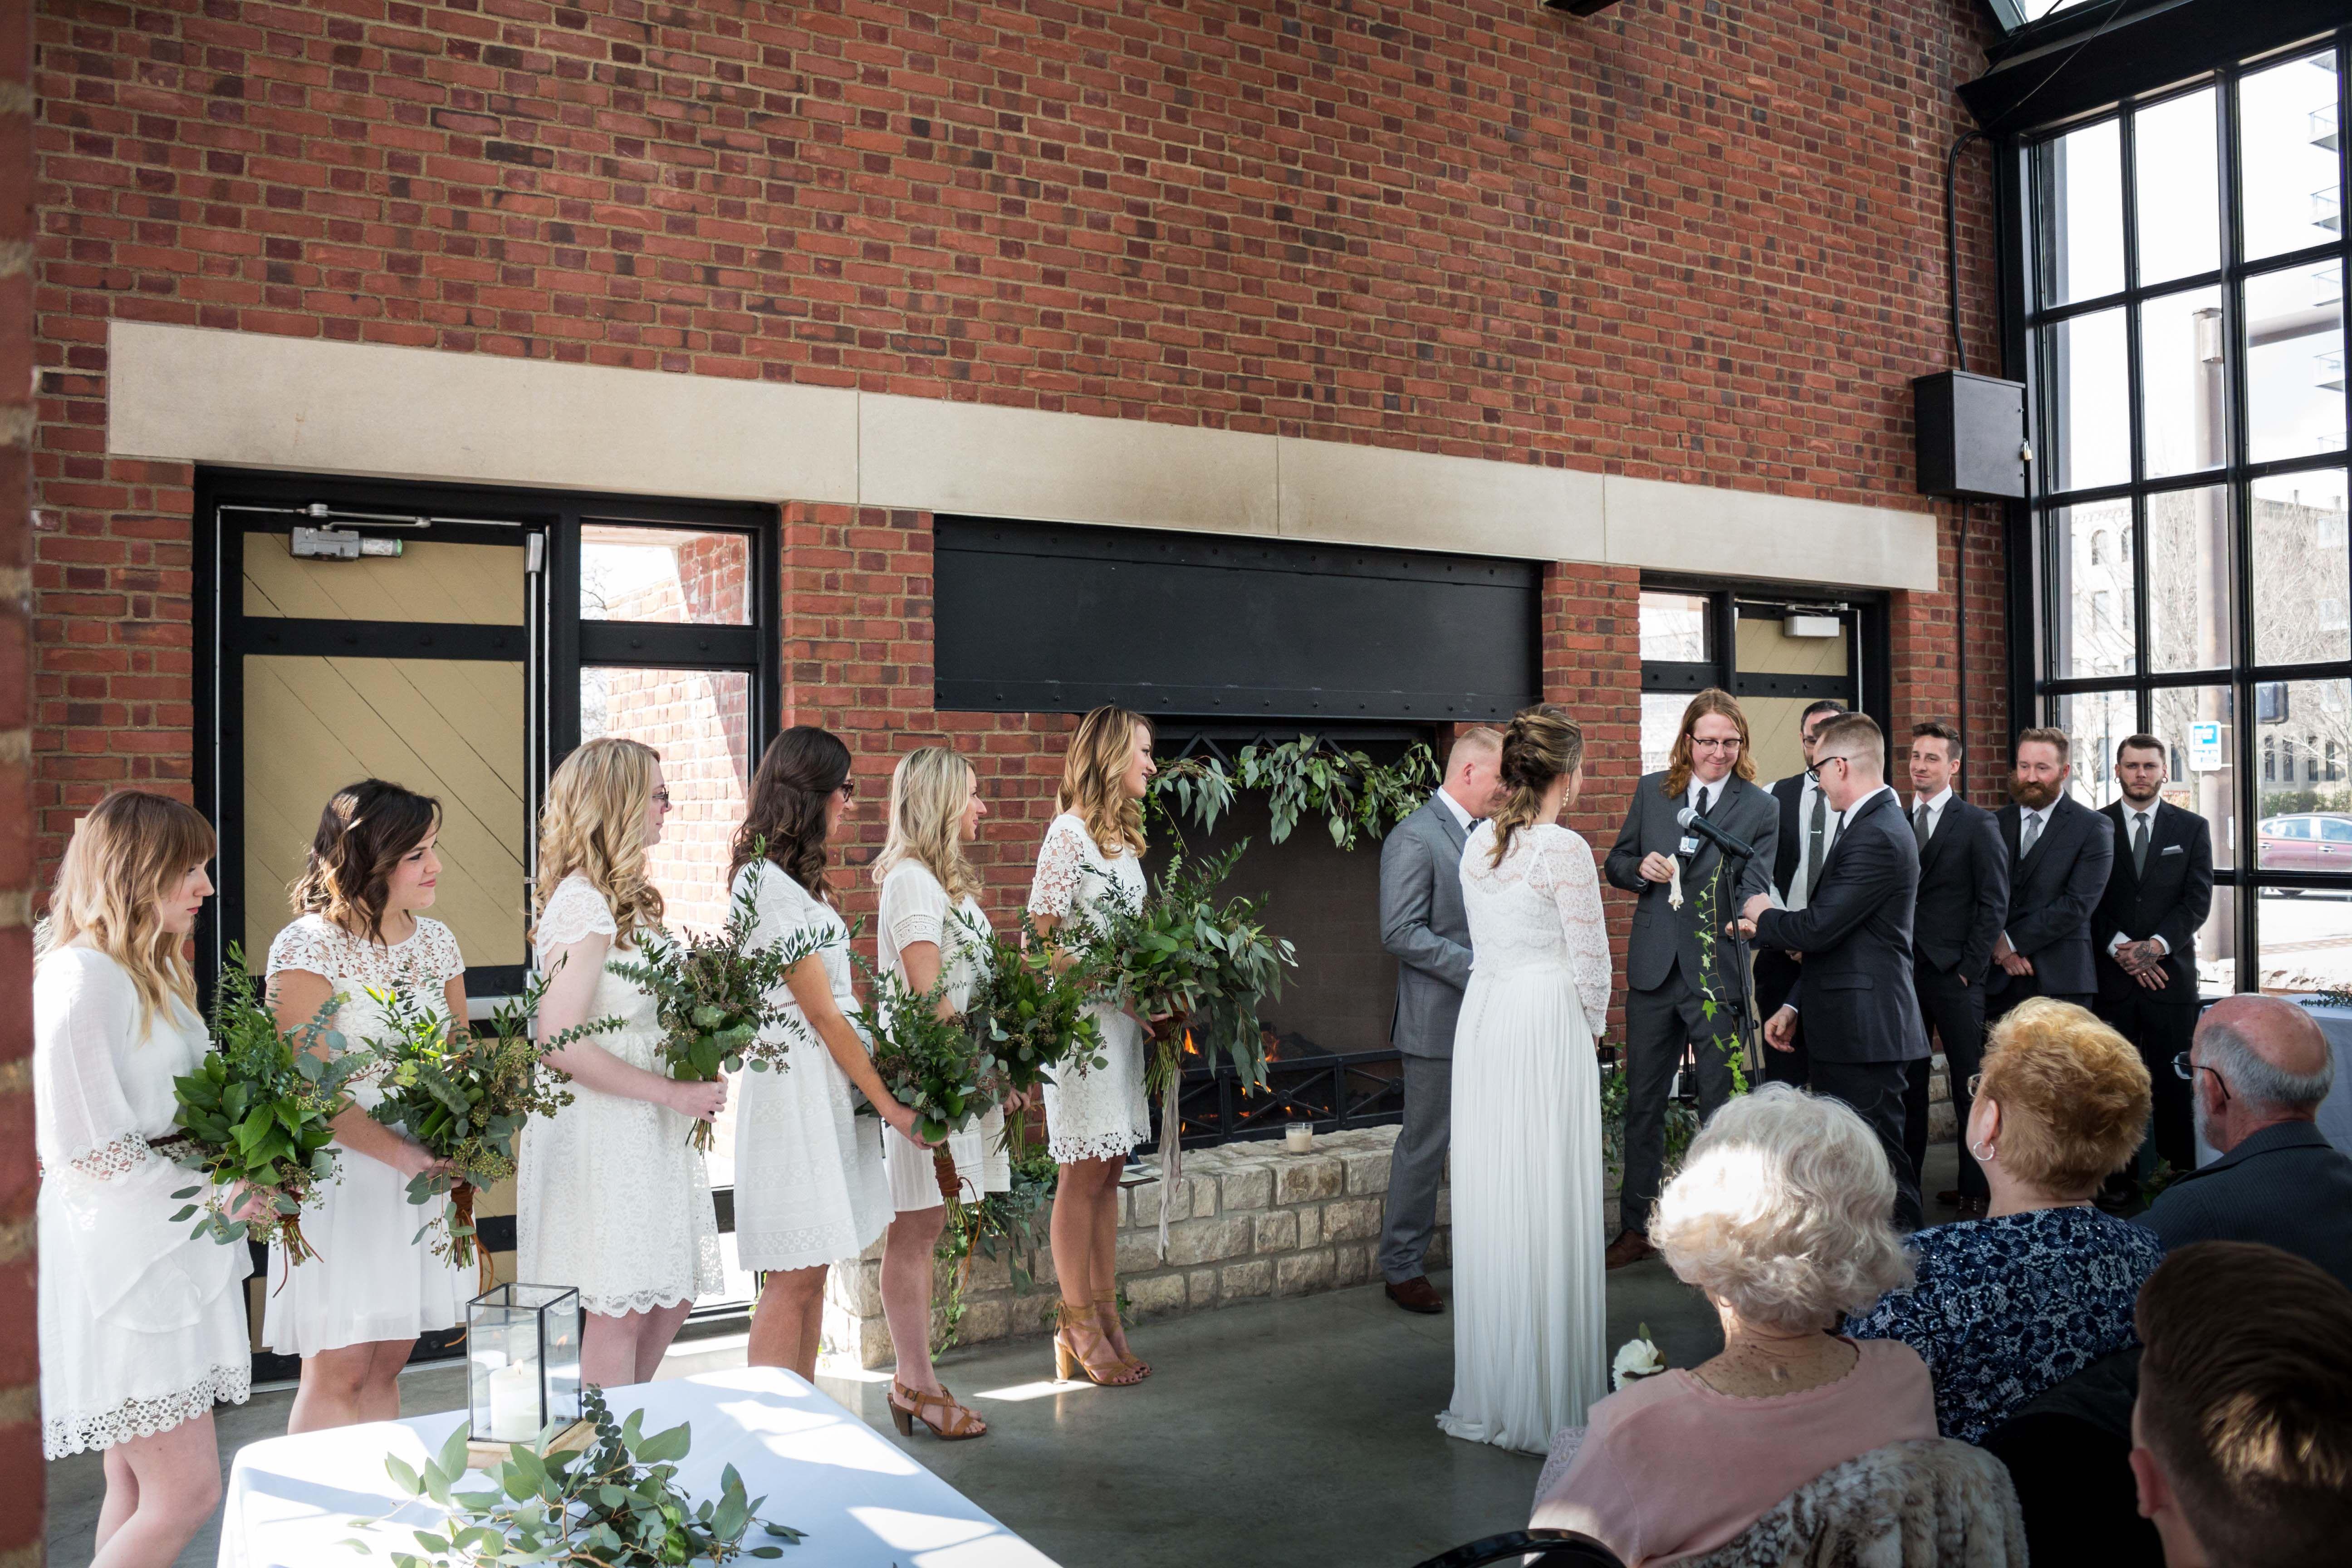 Wedding Ceremony North Bank Park Pavilion Columbus Ohio Wedding Bhldn Bride Photo Greg Davis Florals The Fl Pavilion Wedding Ohio Wedding Venues Wedding